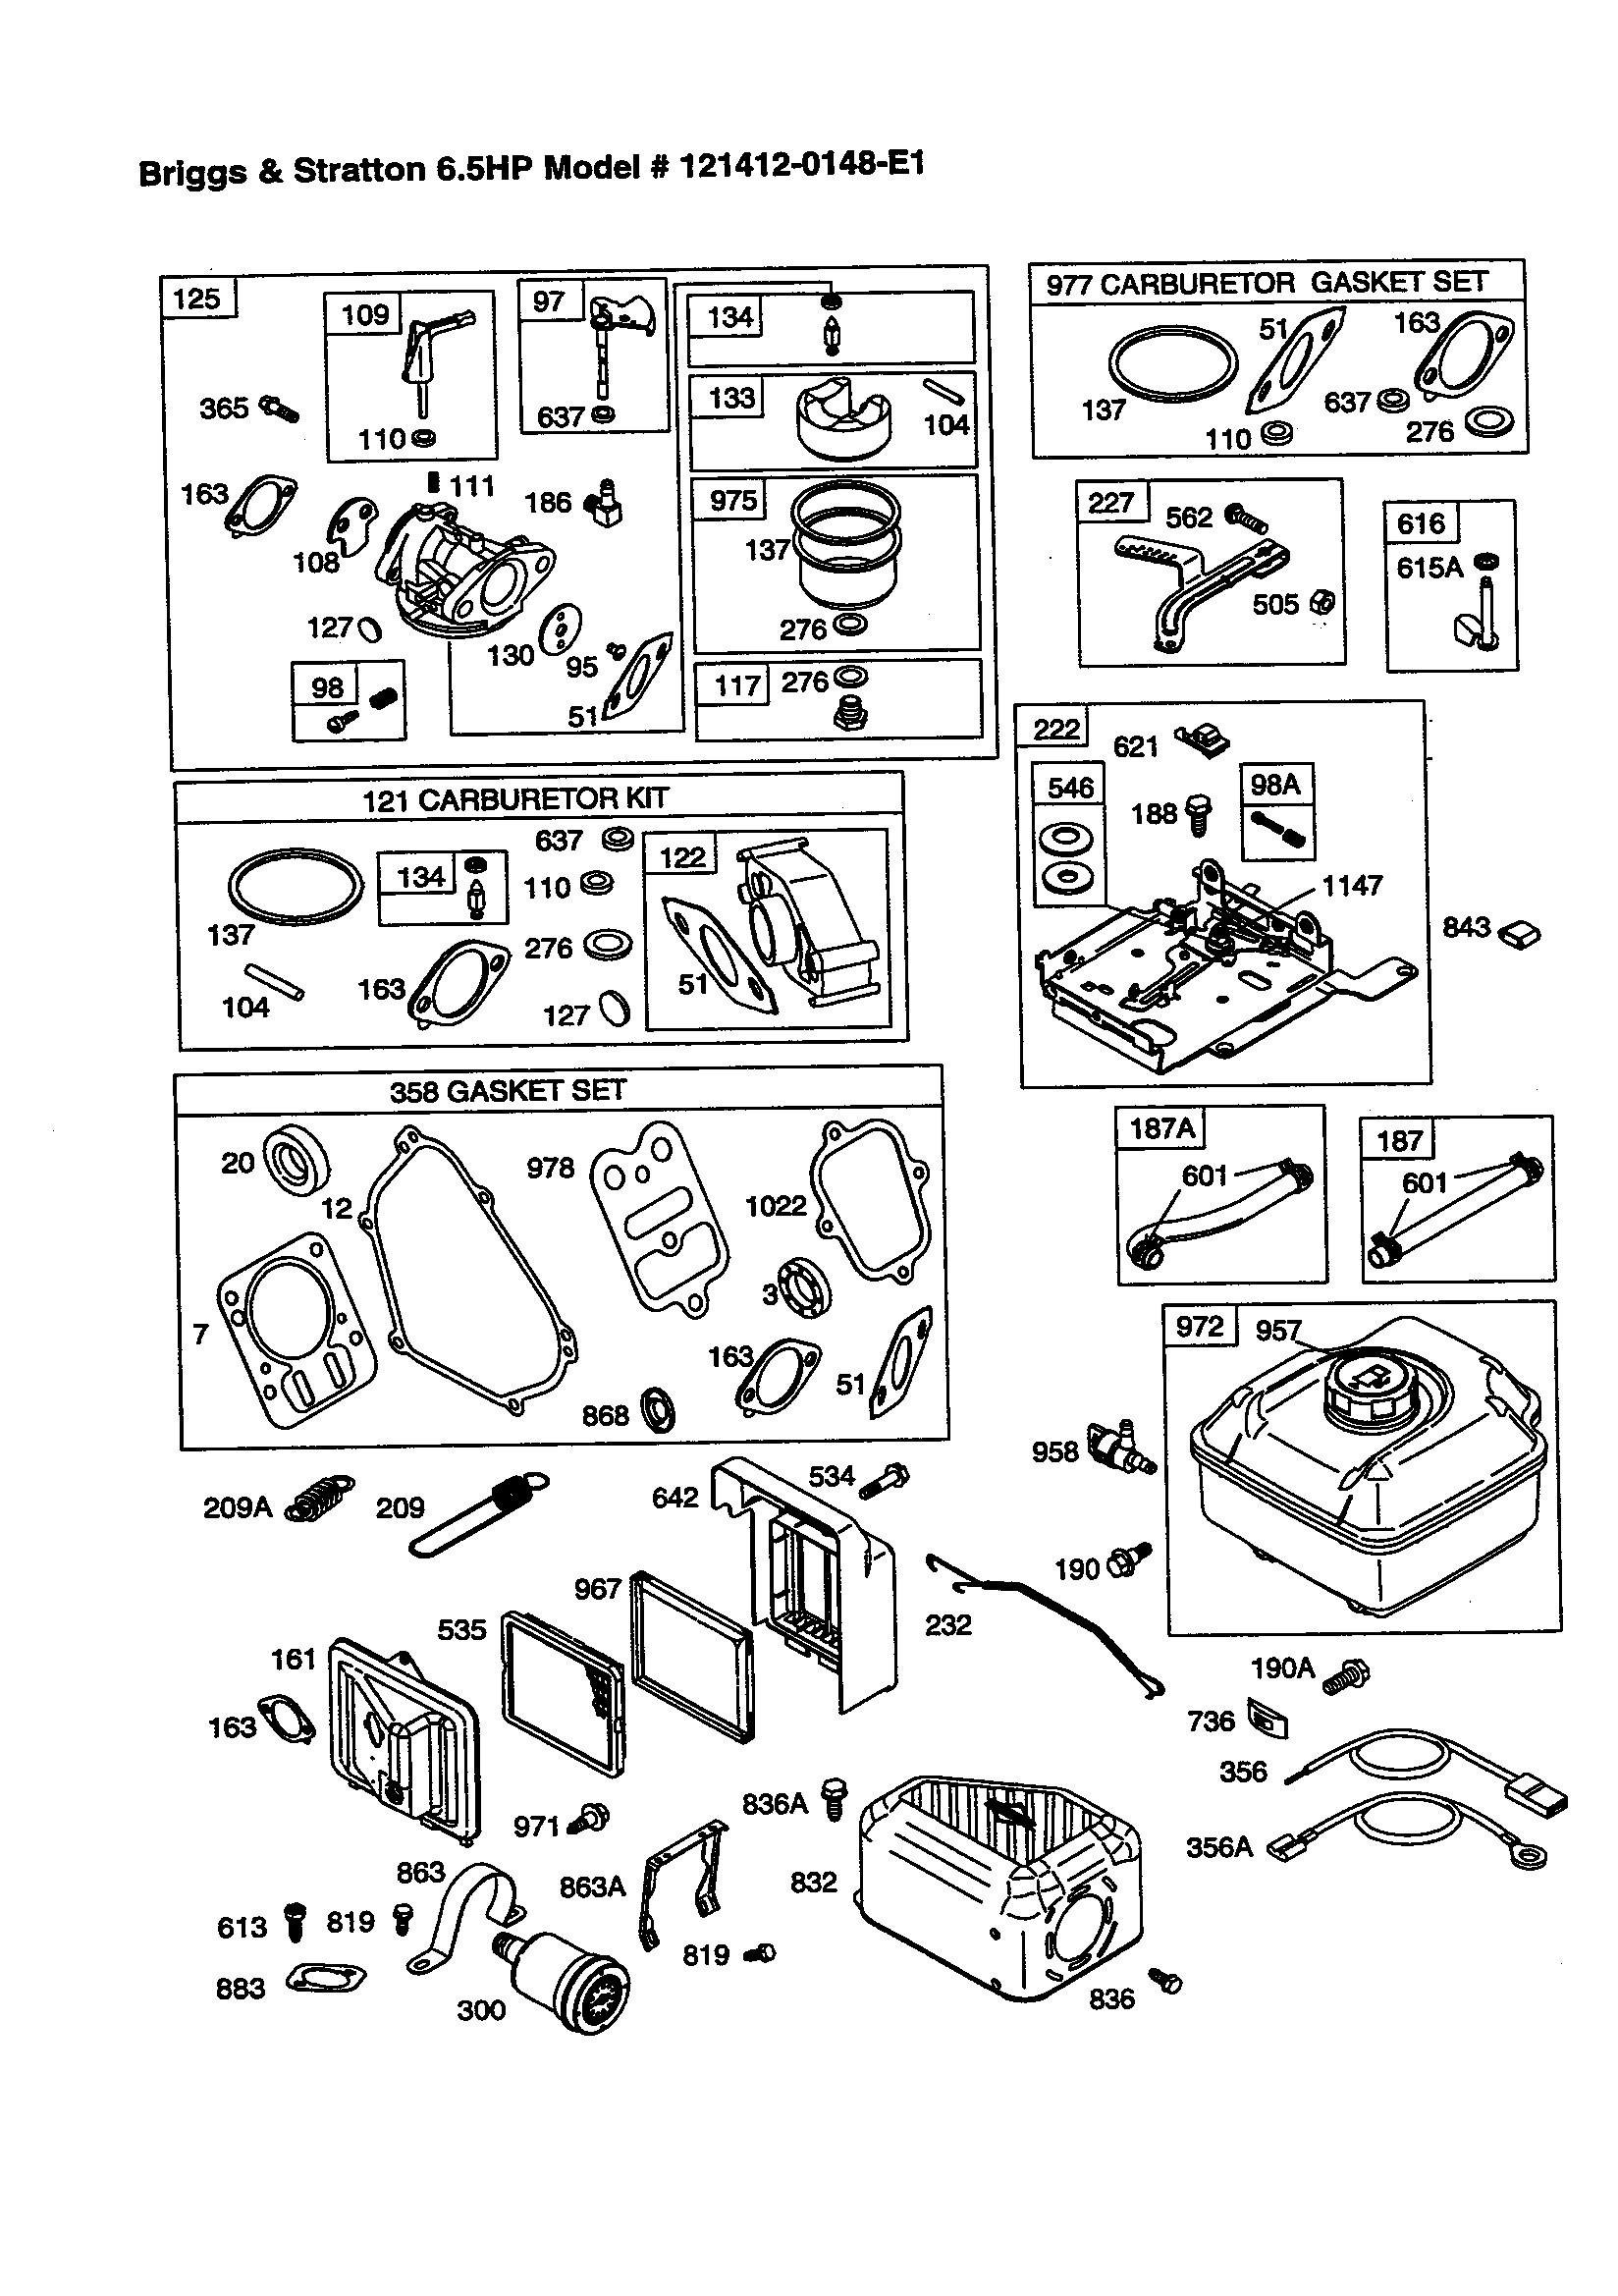 Parts Diagram for Briggs Stratton Engine Briggs Stratton Parts Diagram Fancy Briggs and Stratton Engine Parts Of Parts Diagram for Briggs Stratton Engine